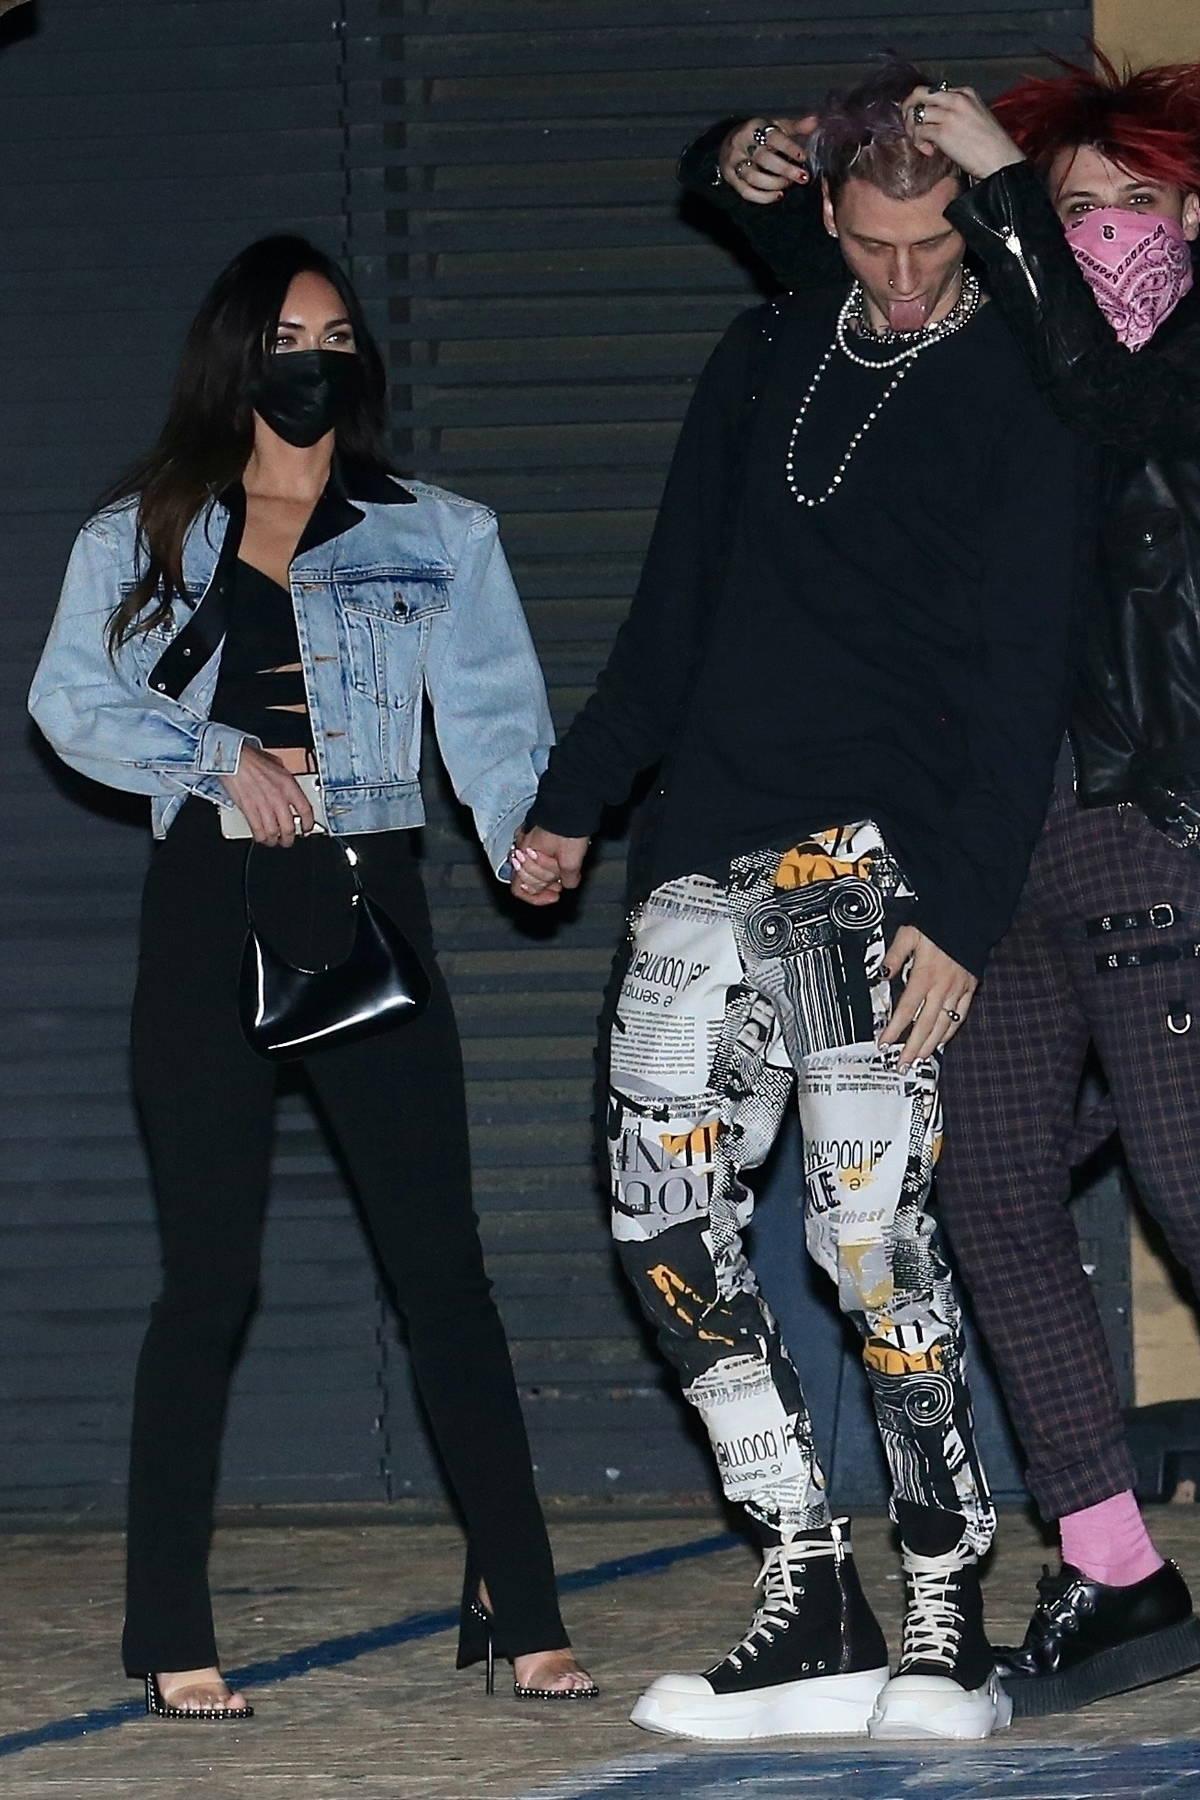 Megan Fox and Machine Gun Kelly seen grabbing dinner with friends at Nobu in Malibu, California